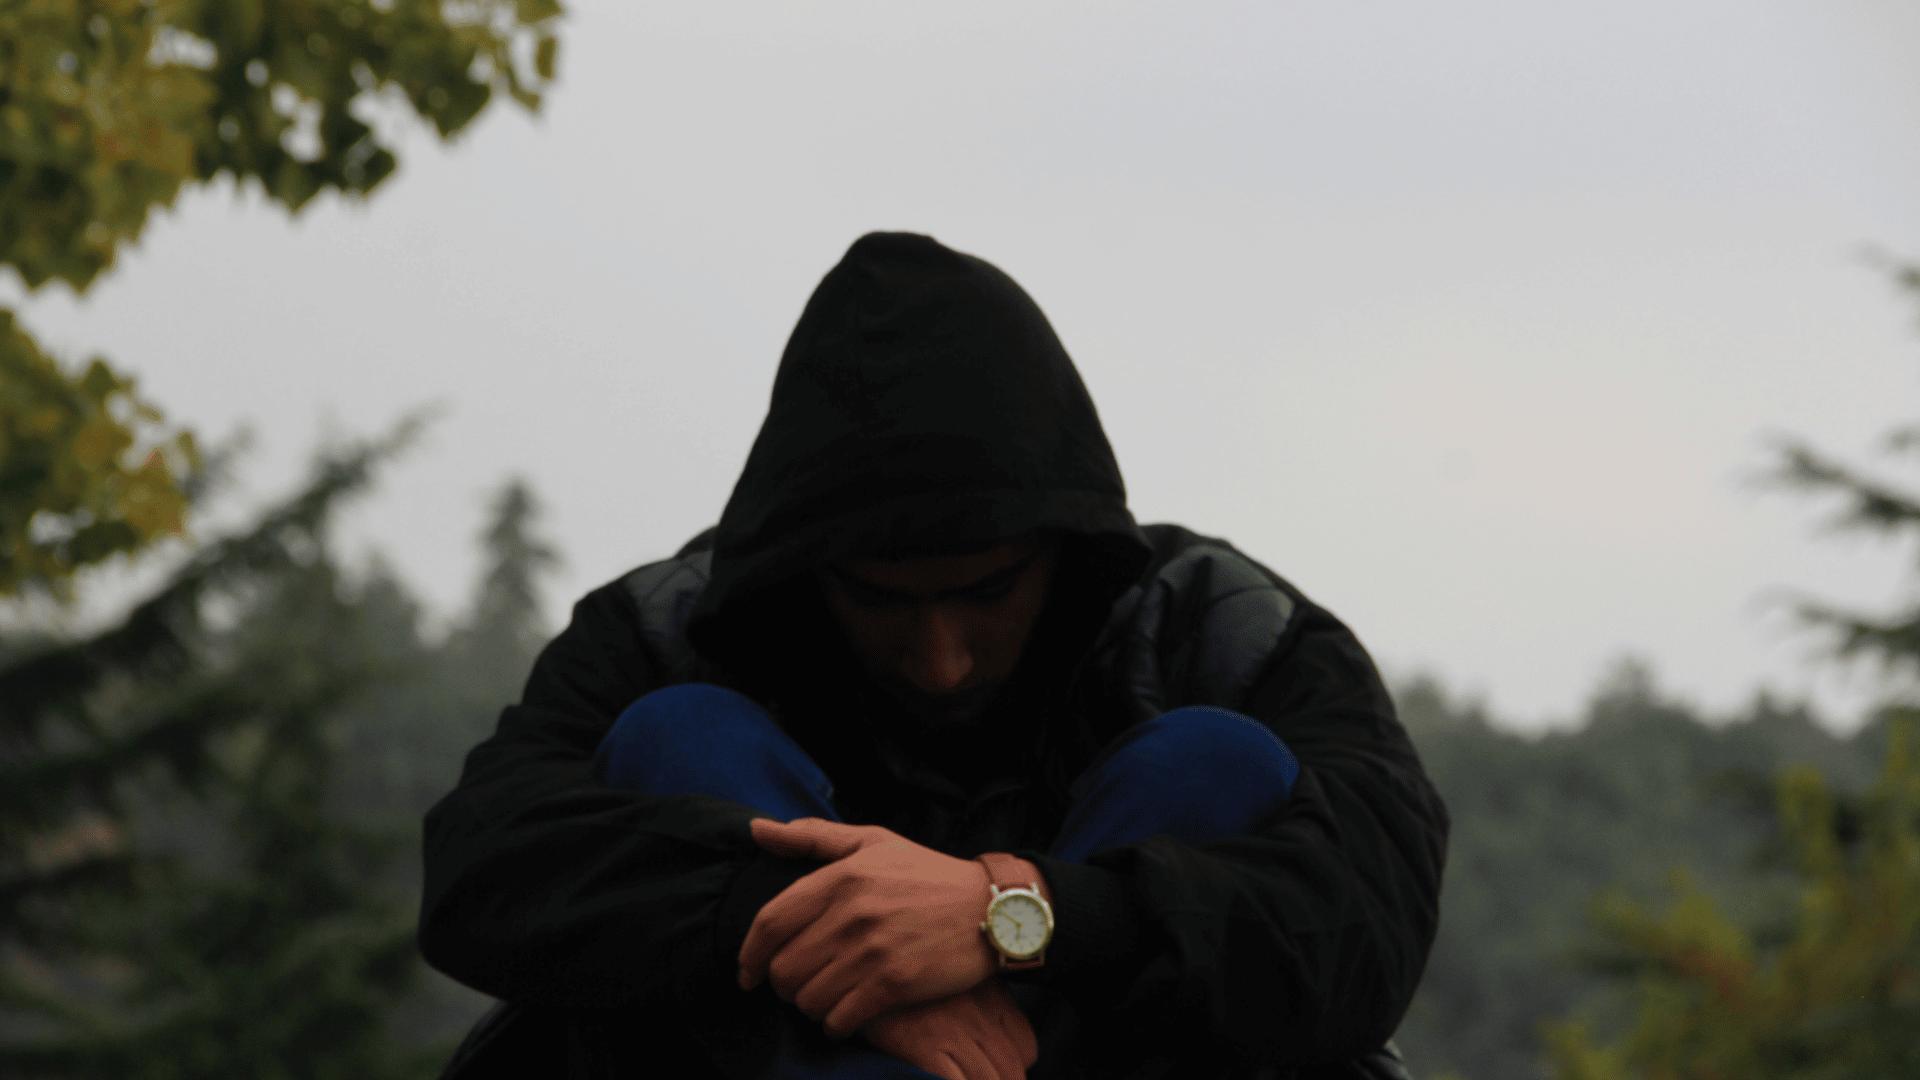 man wearing black hood with head down